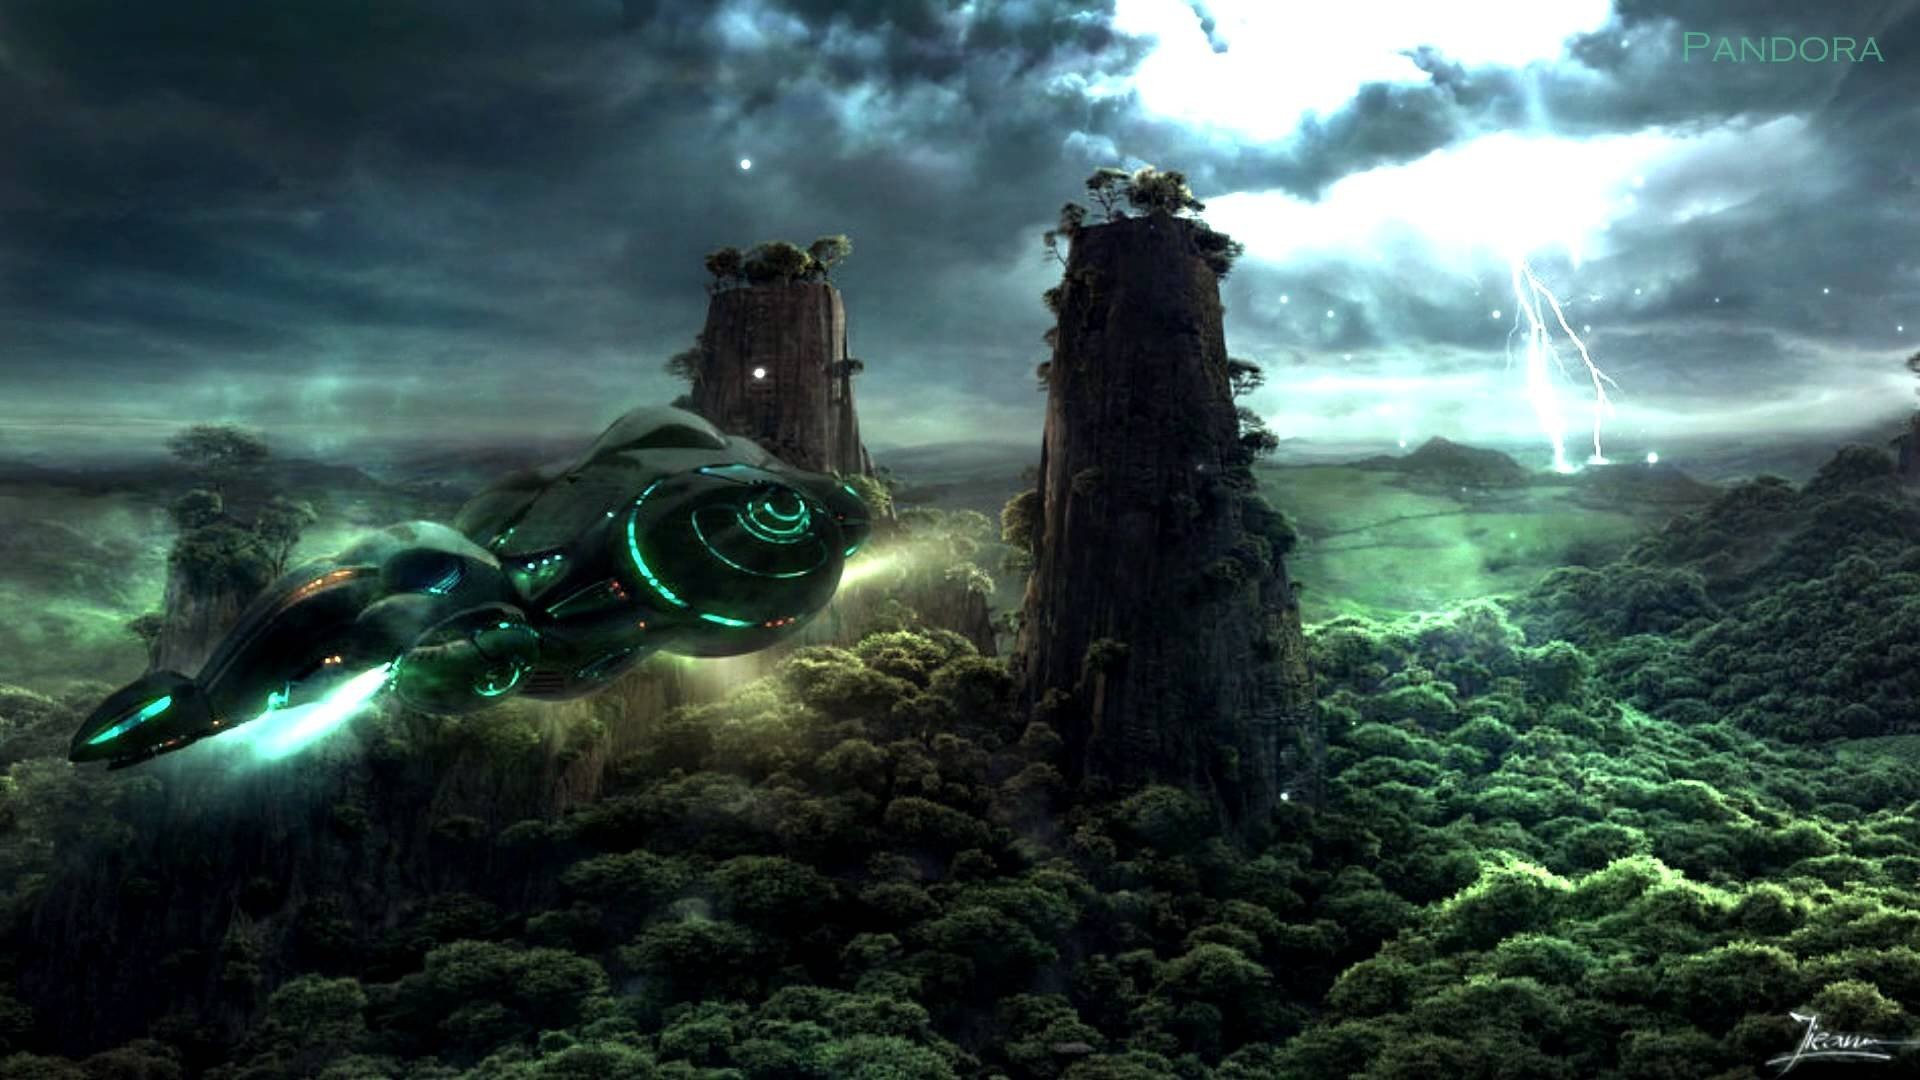 PROMETHEUS ALIEN COVENANT aliens sci-fi futuristic adventure spaceship  wallpaper | | 906158 | WallpaperUP